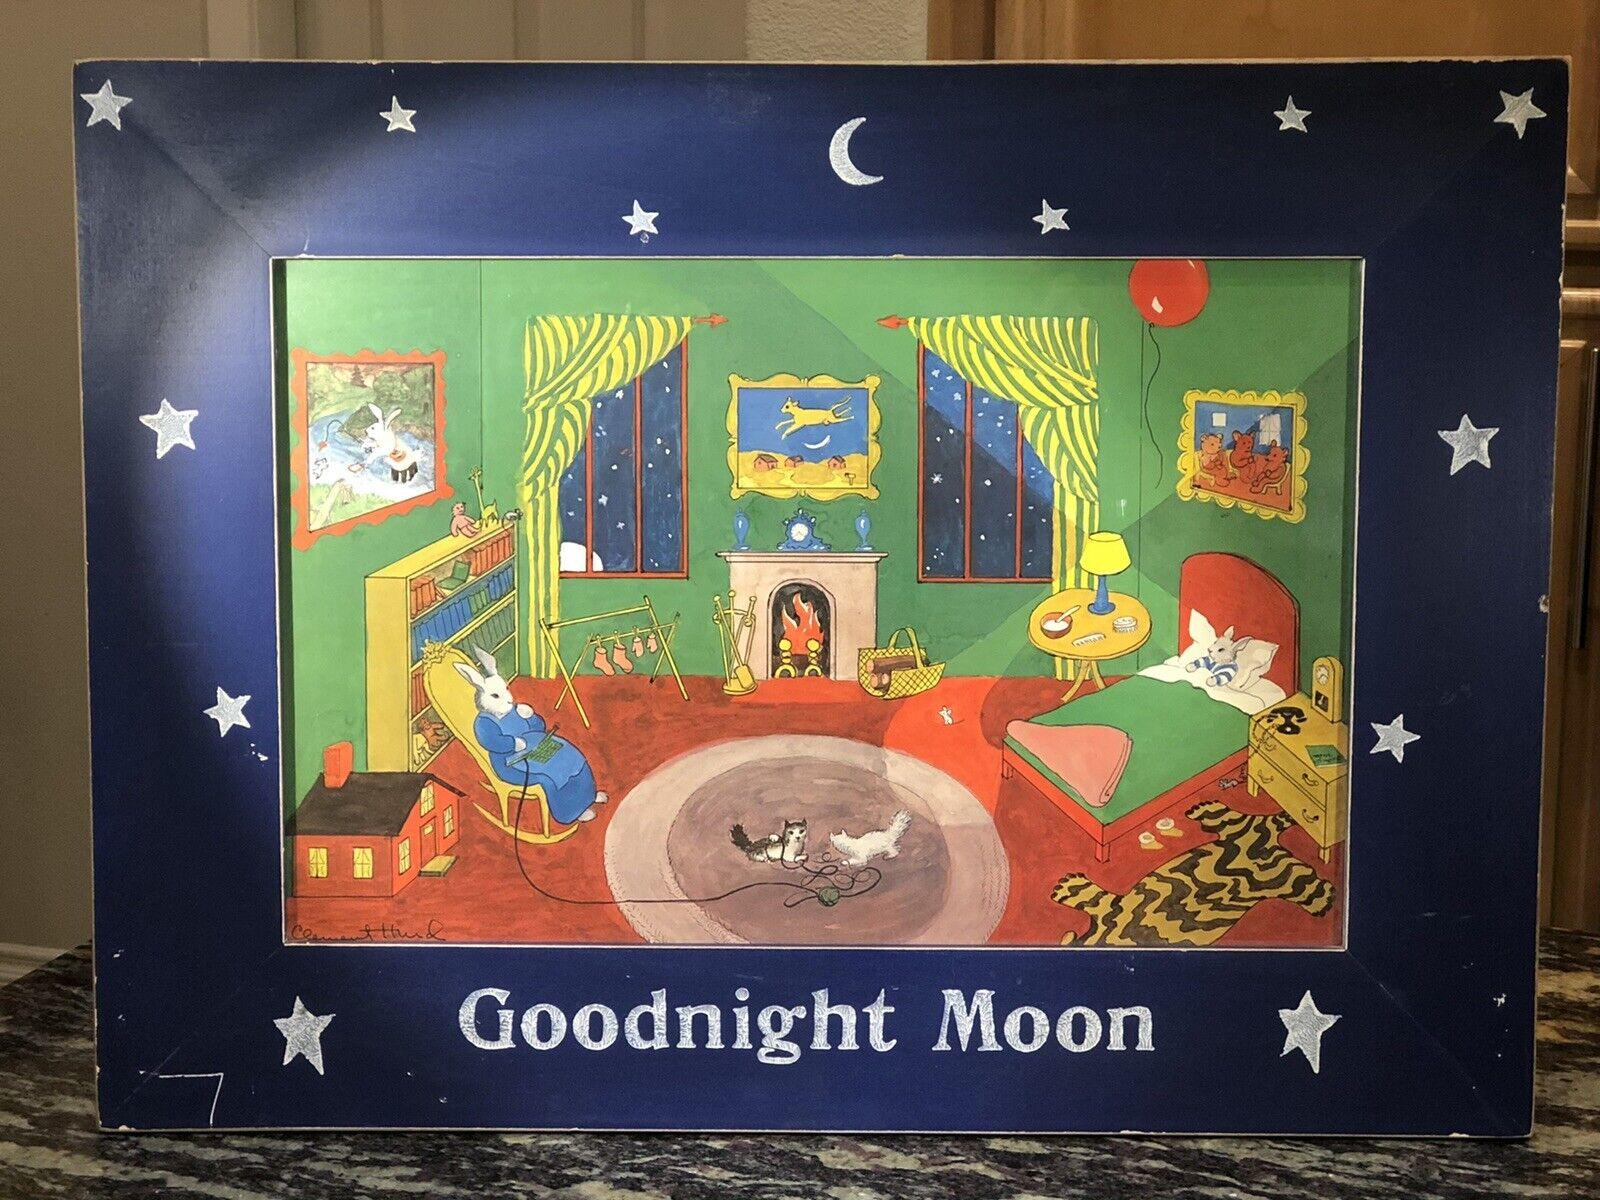 Vintage Goodnight Moon Framed Print by Clement Hurd (1993) on eBay thumbnail